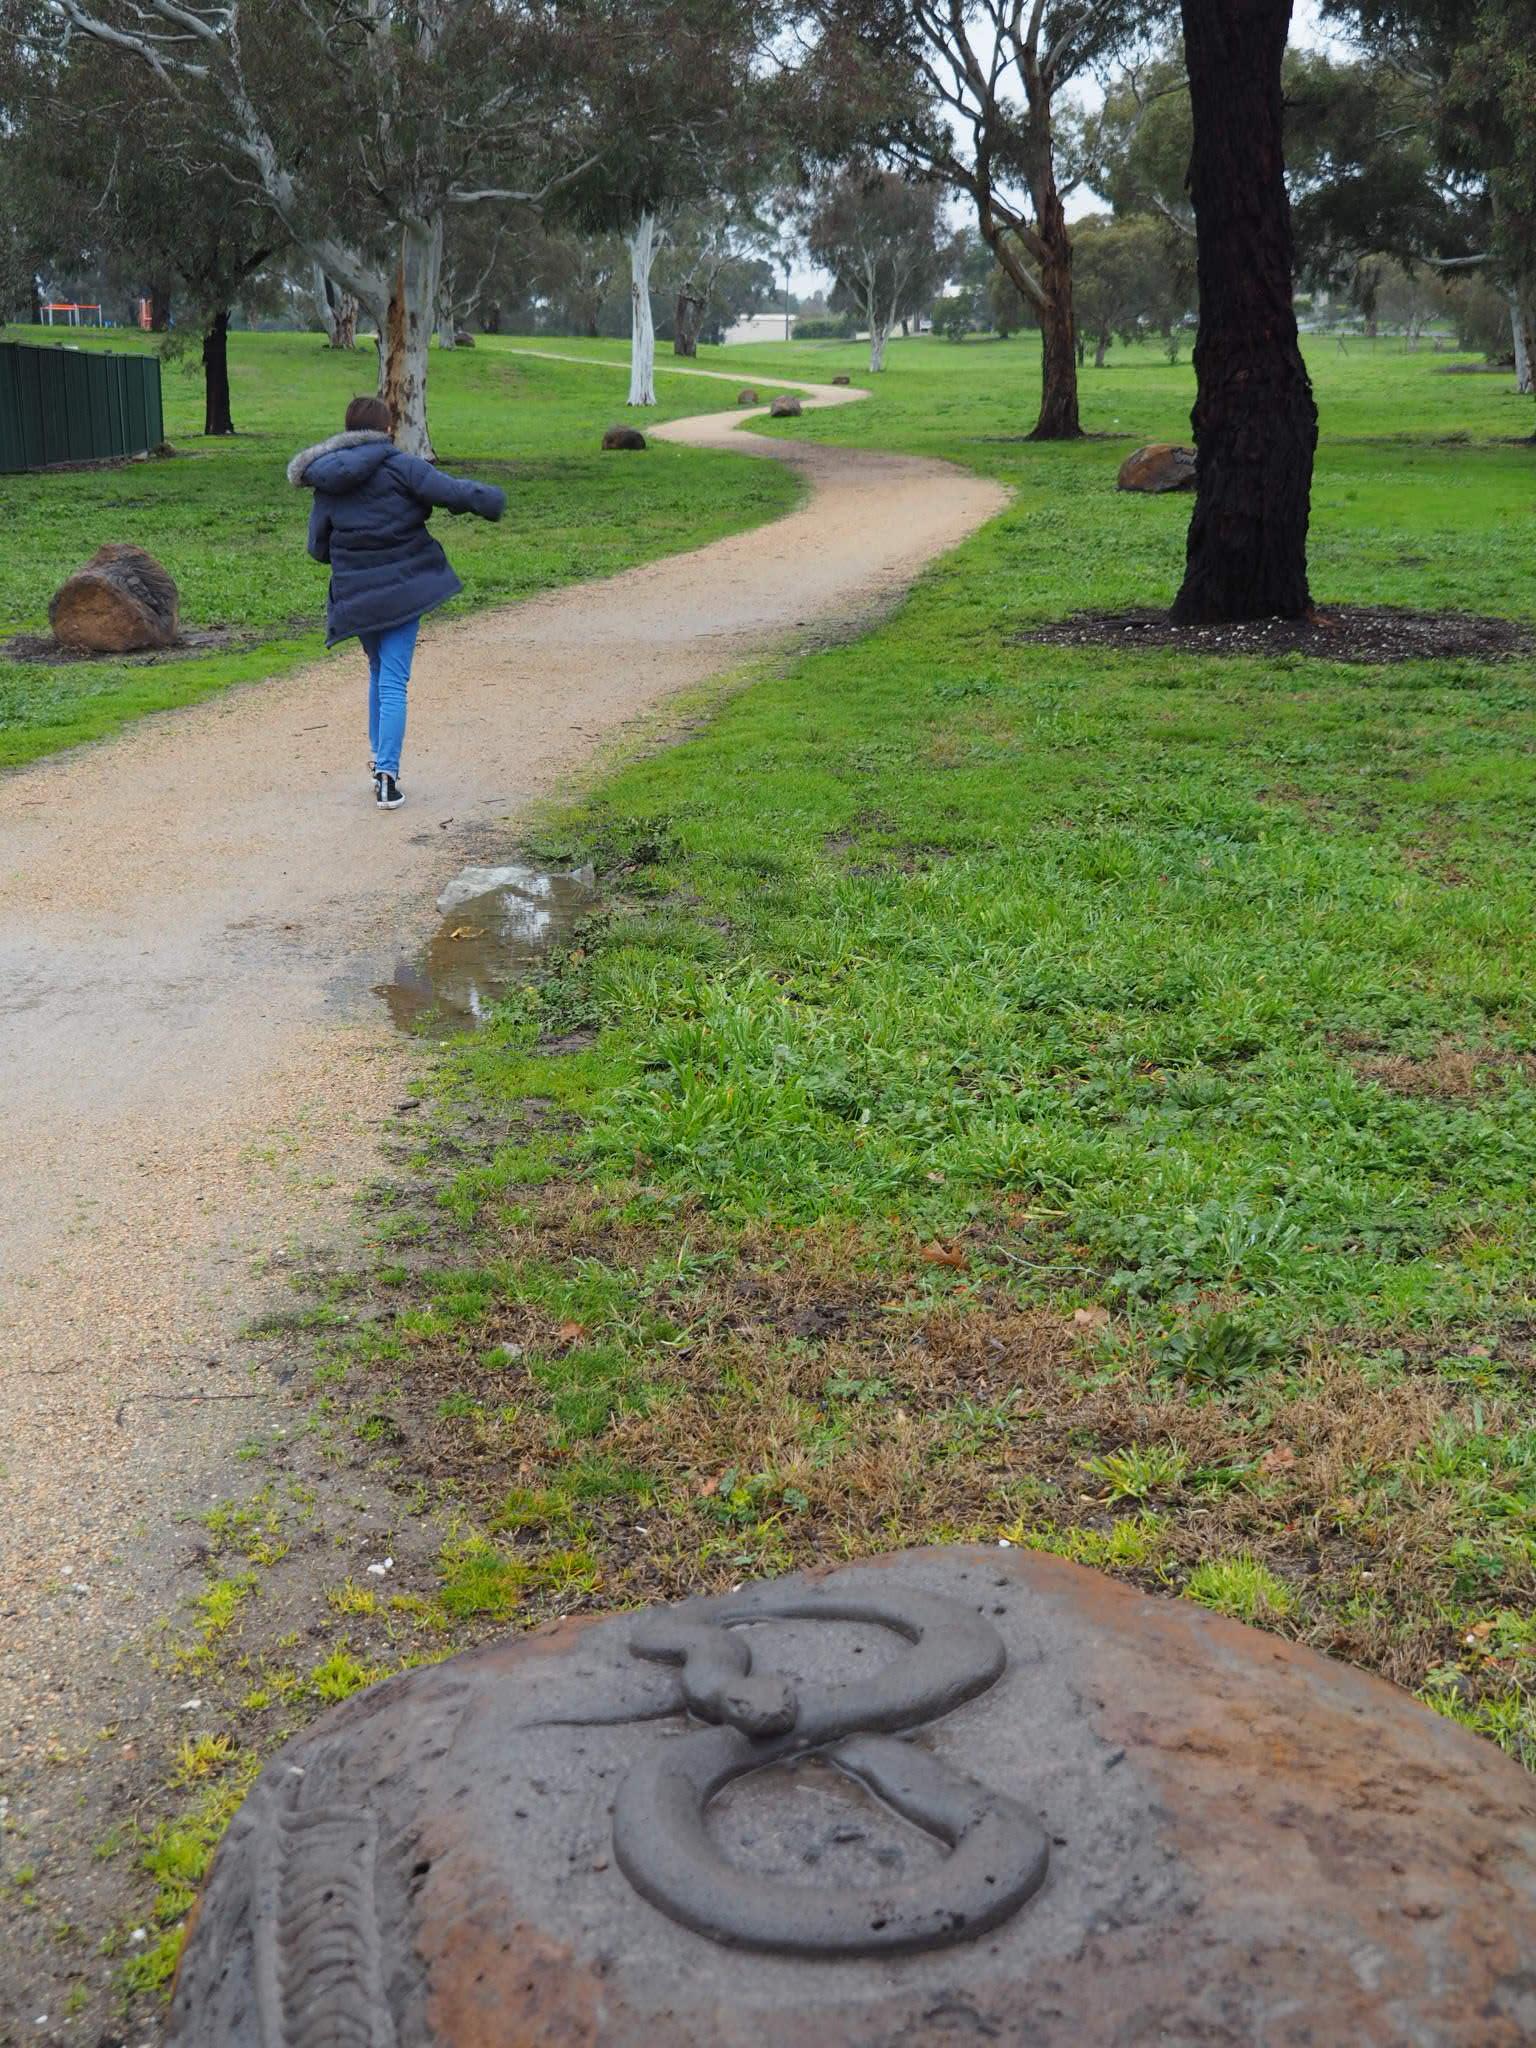 Joe Pratt; Research Artist Forest Kegeel, Penny Weight Park